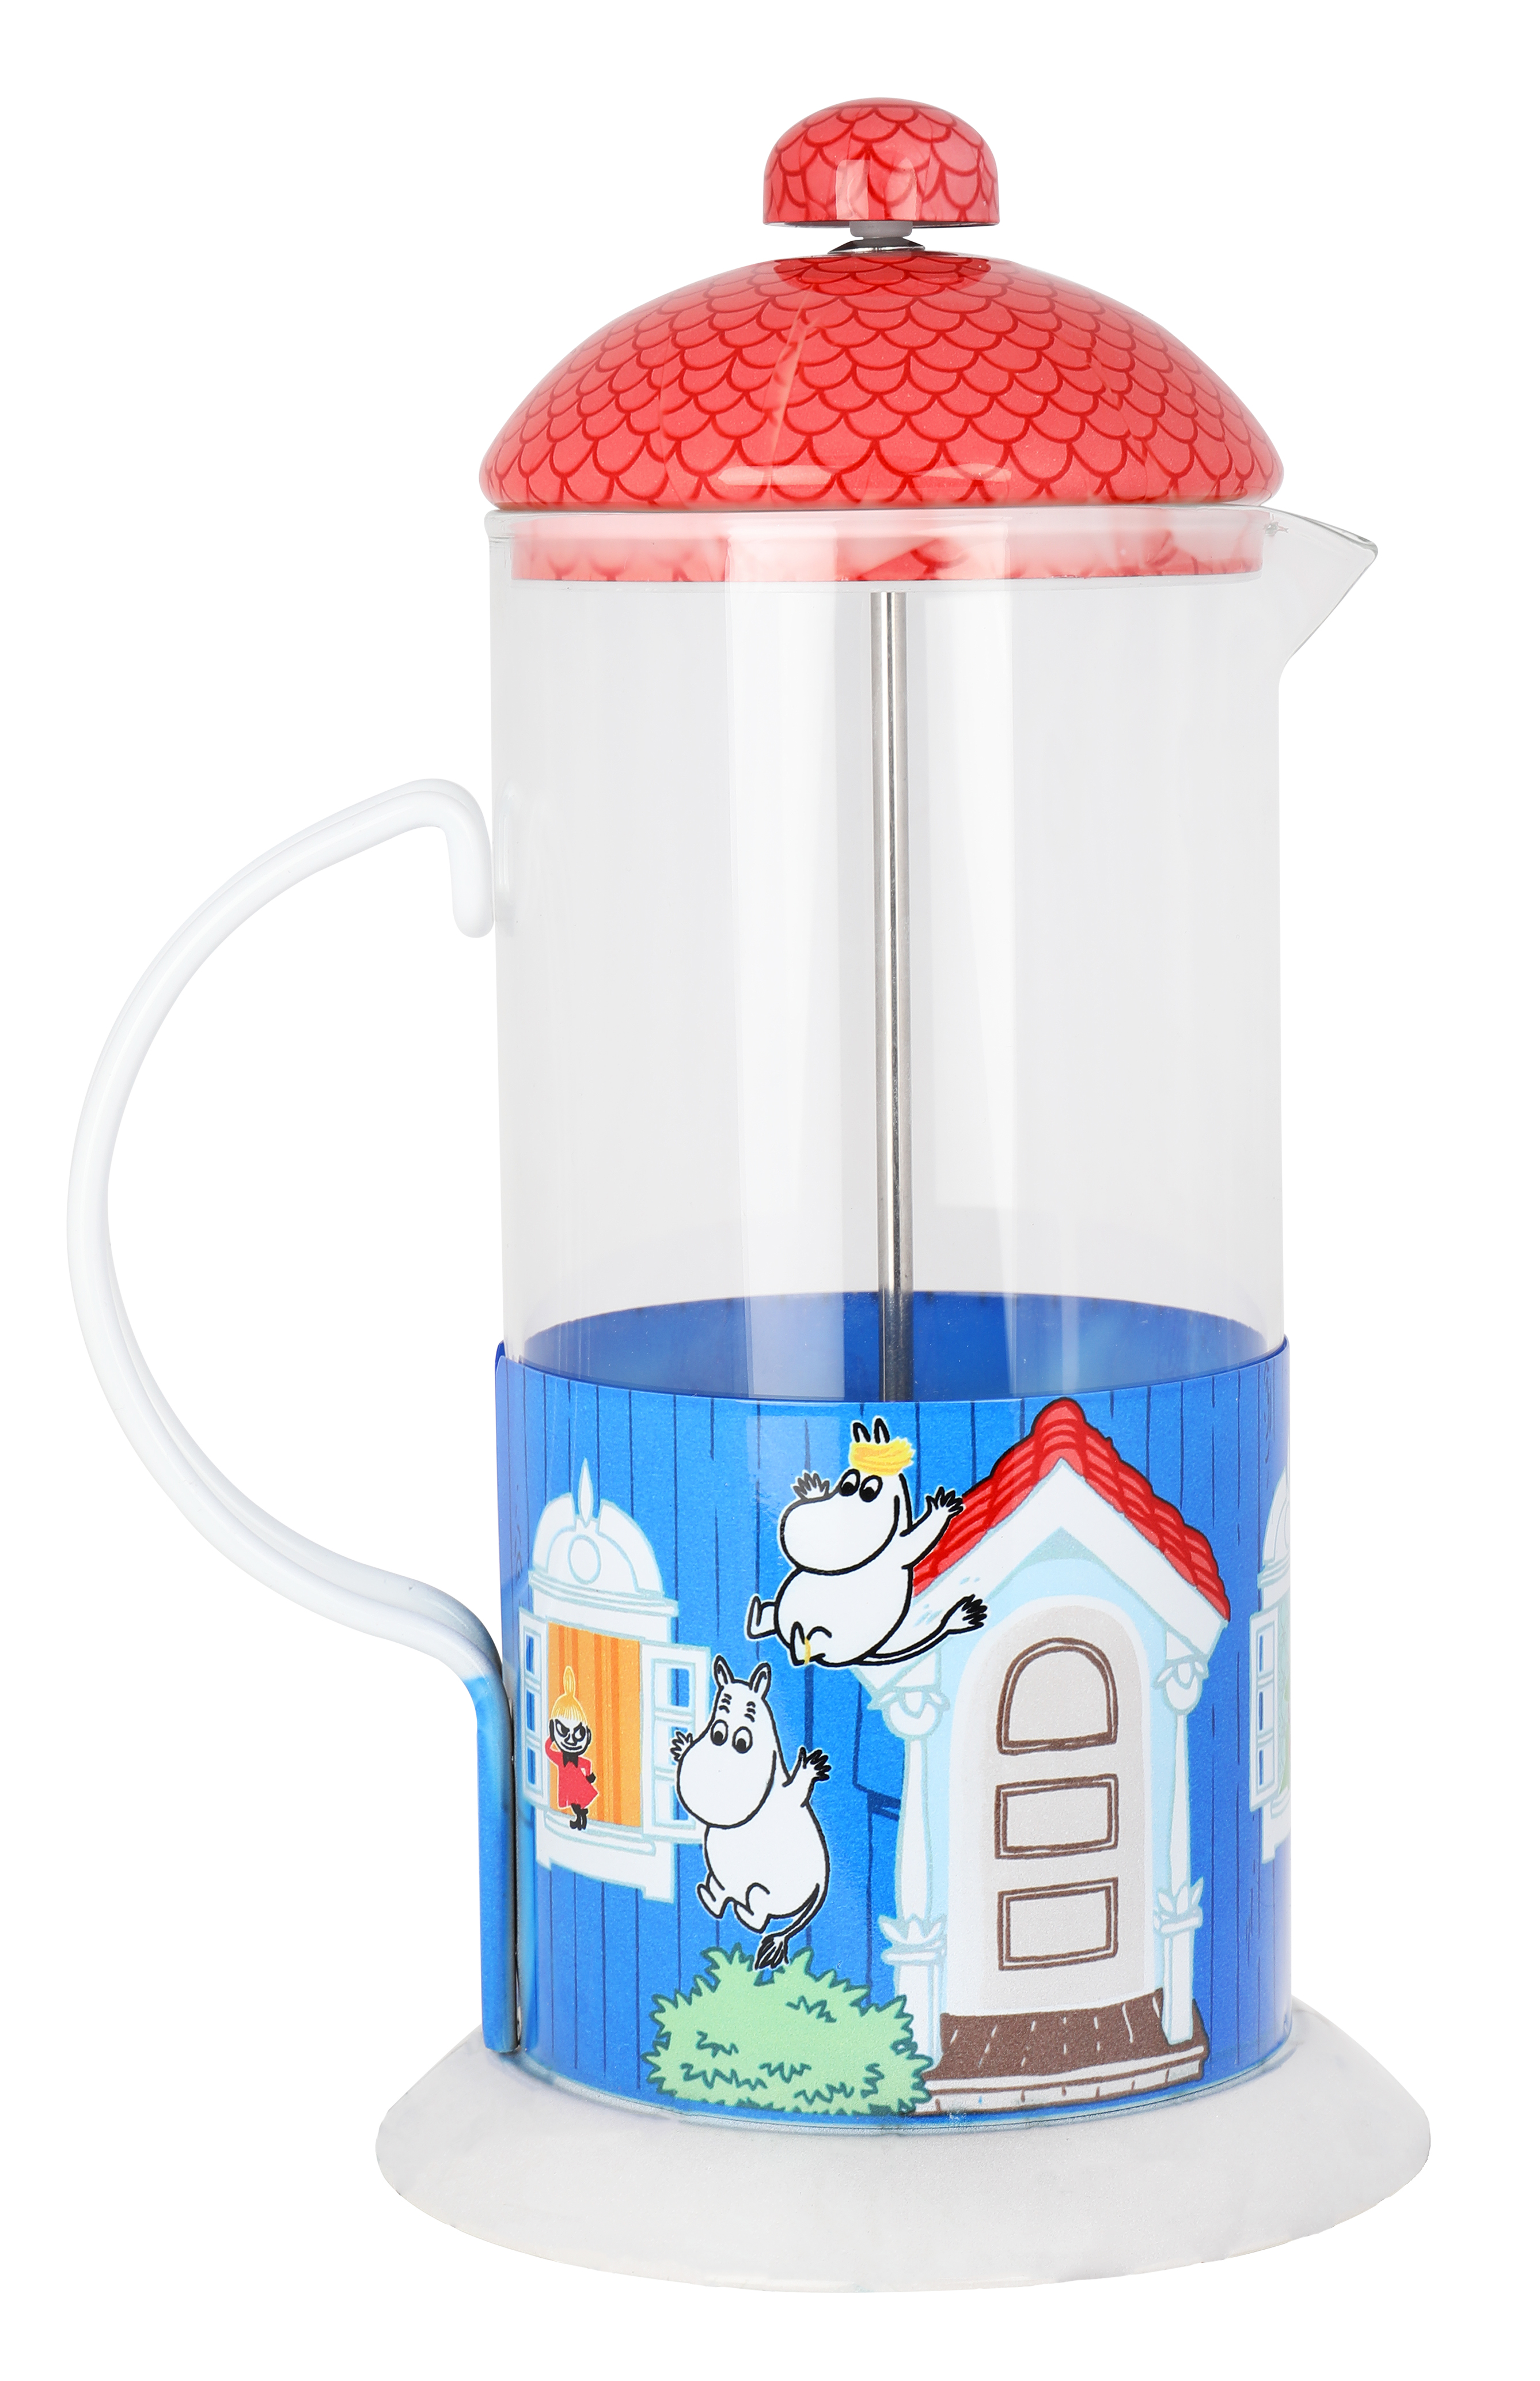 Martinex Moomin Moominhouse Cafetiere